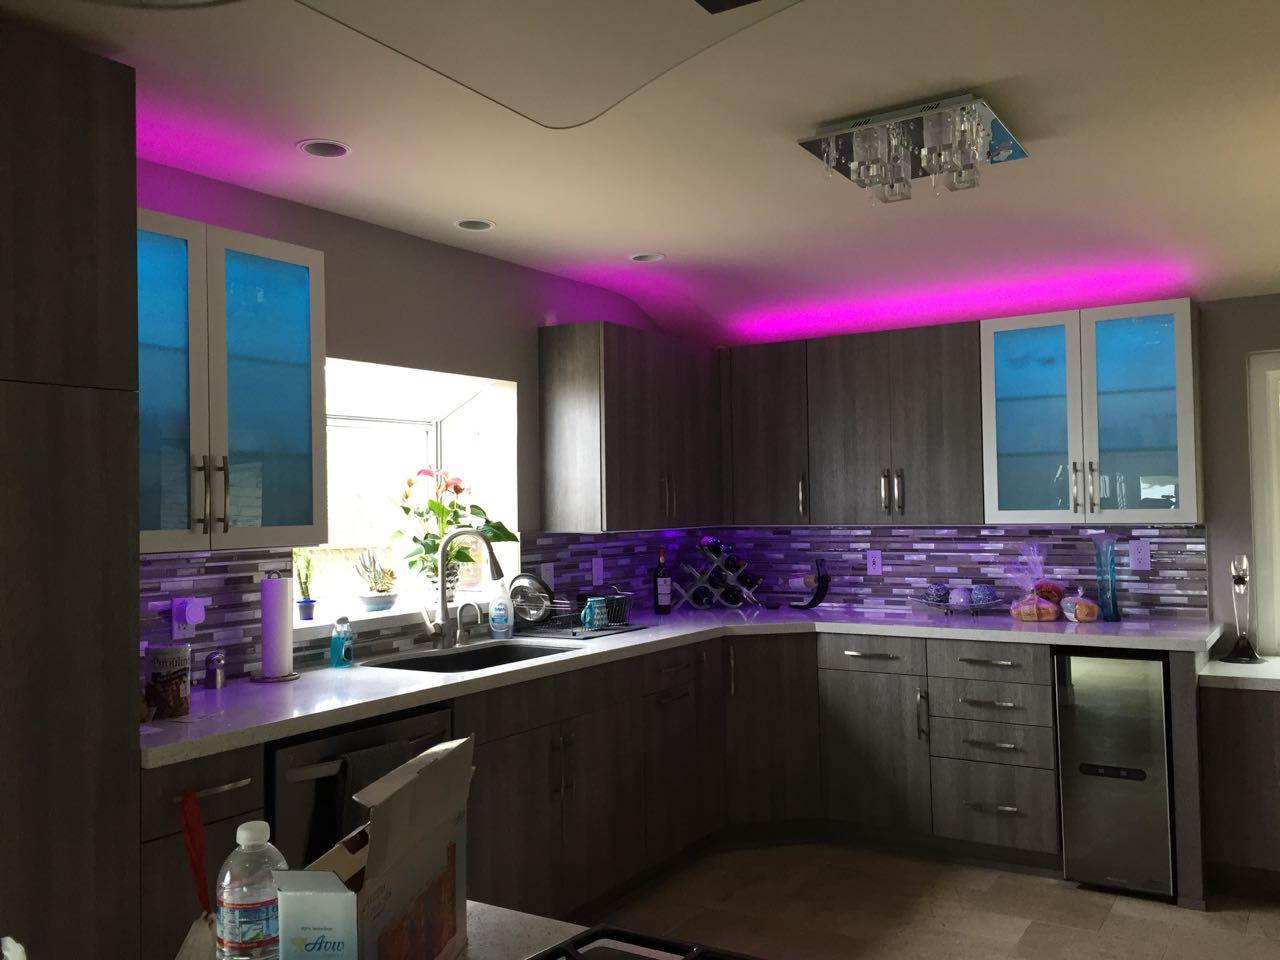 Sylvania Lightify Flex Rgbw Lighting Review Smart Strip